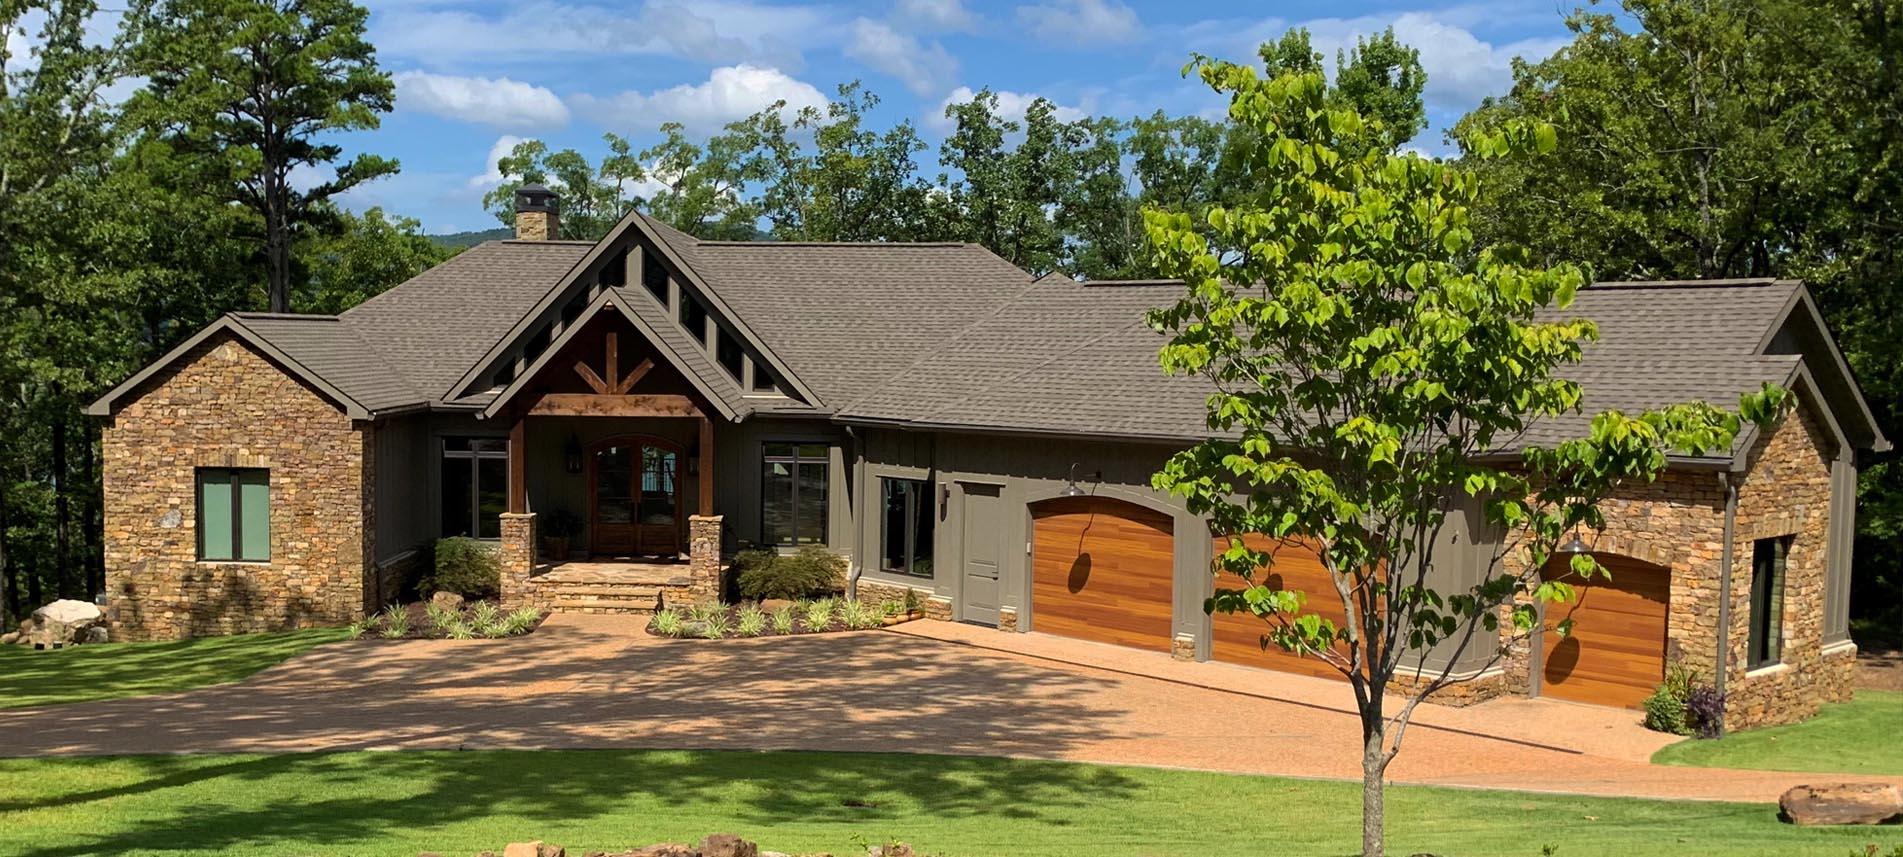 Nelson Design Group › Unique House Plans, Custom Home Designs, Homestyles